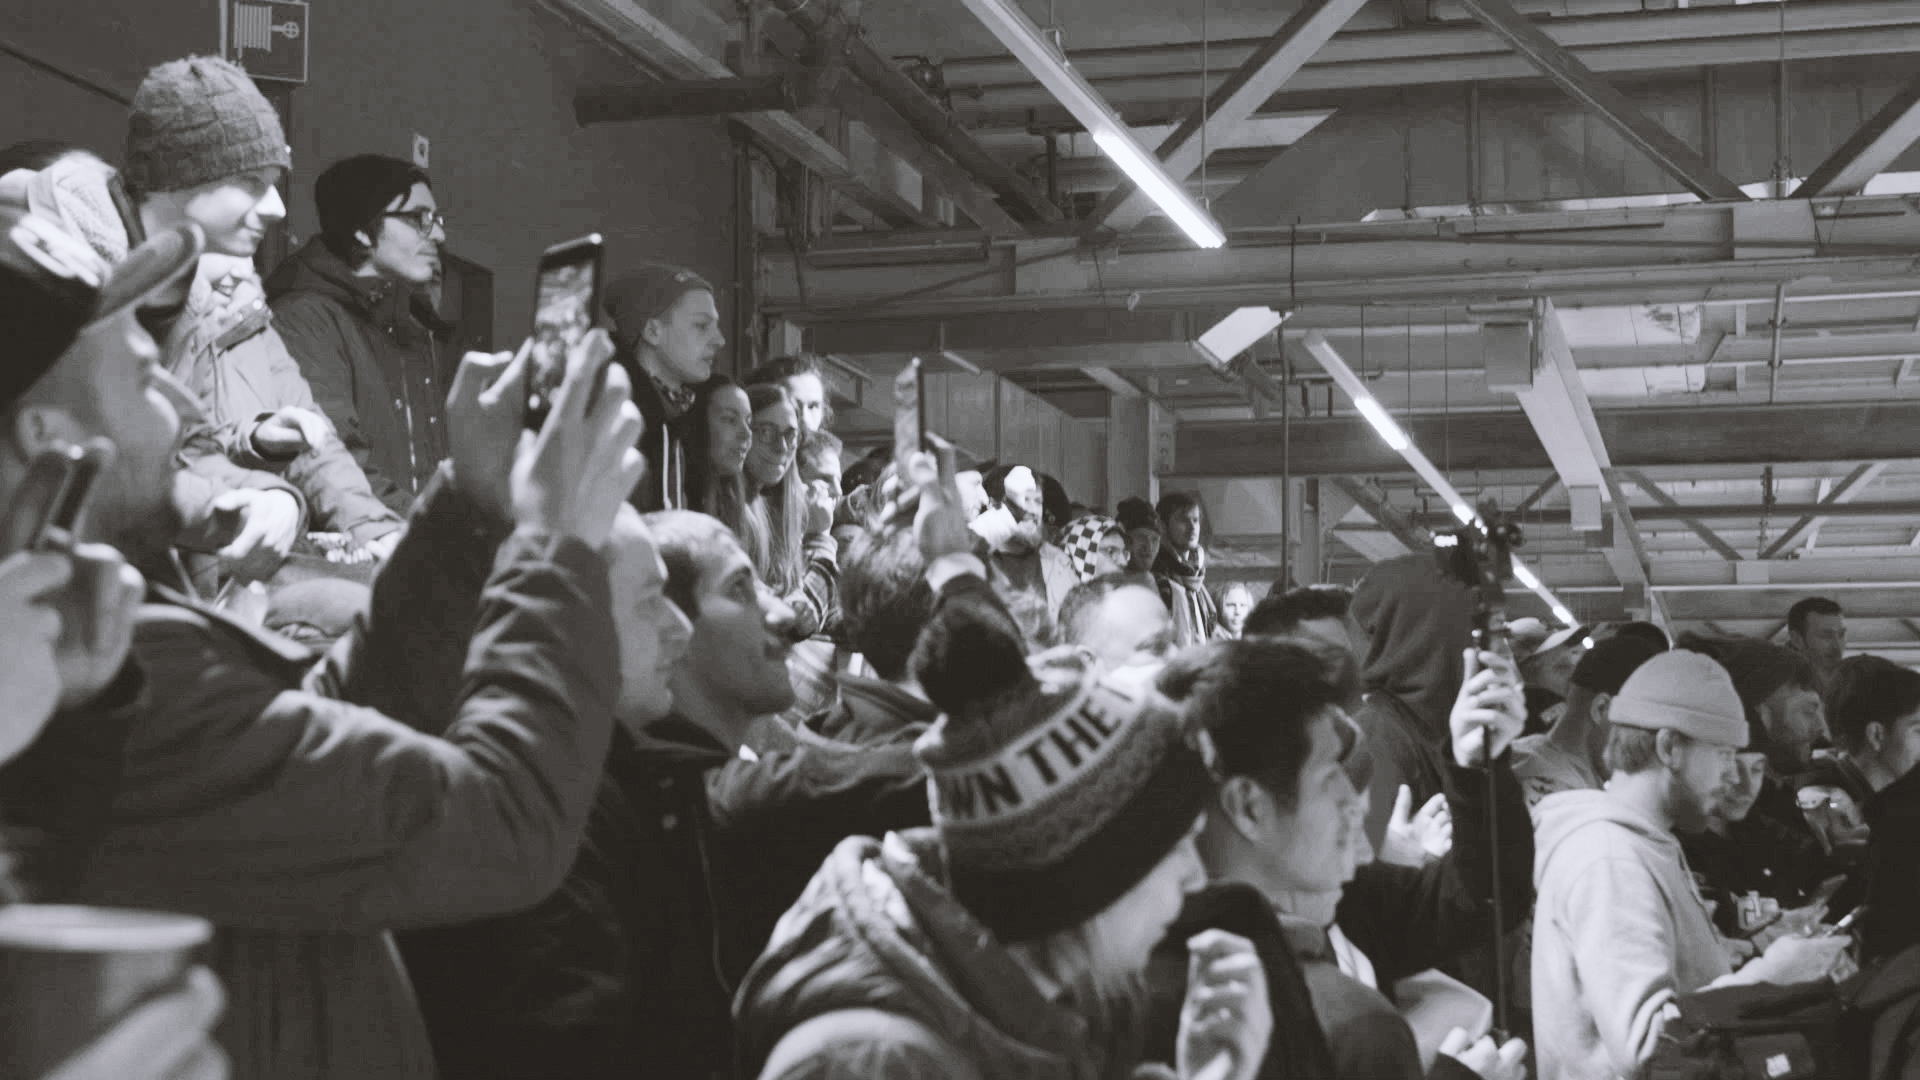 Crowd04.jpg